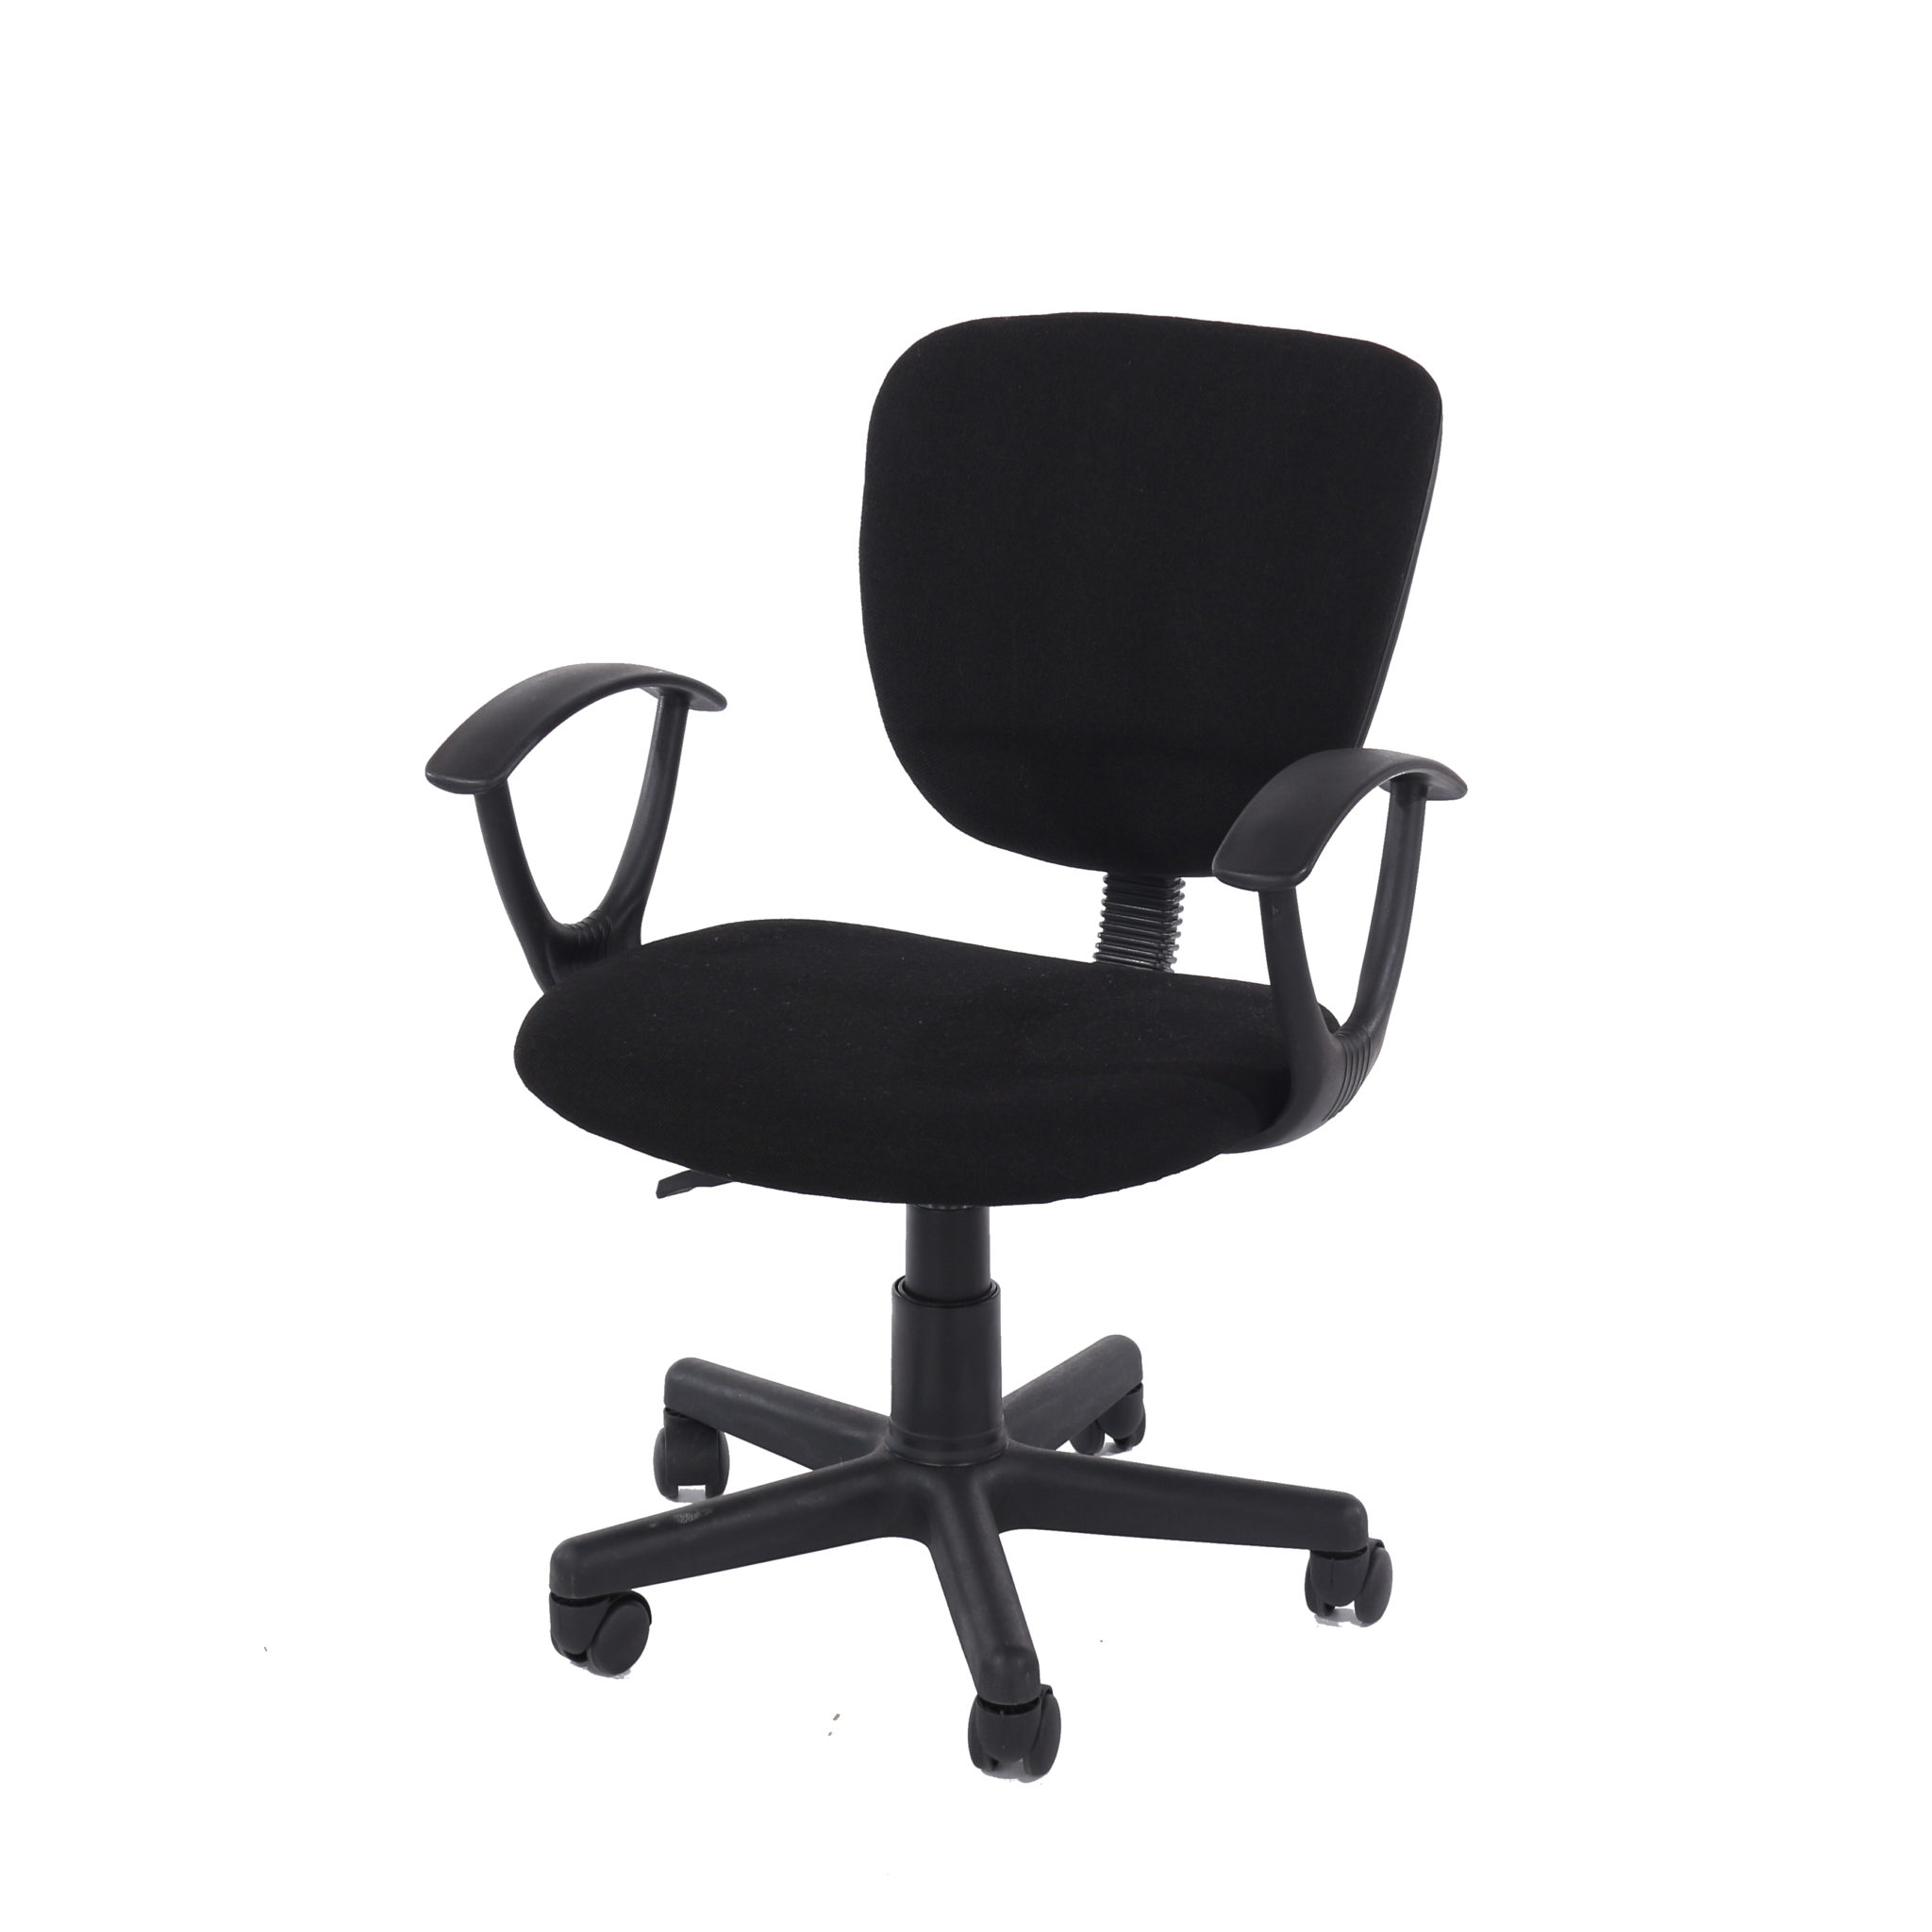 study chair in black fabric black base